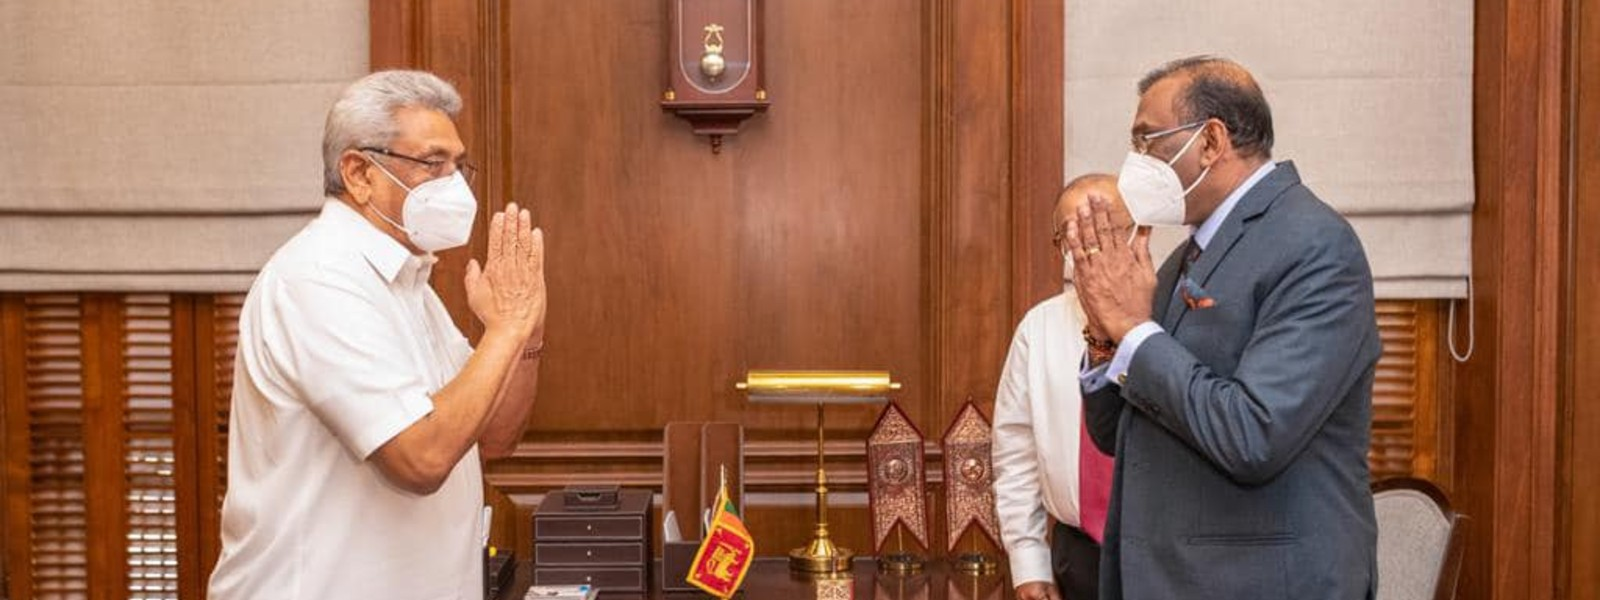 Sanjay Rajaratnam sworn in as new Attorney General